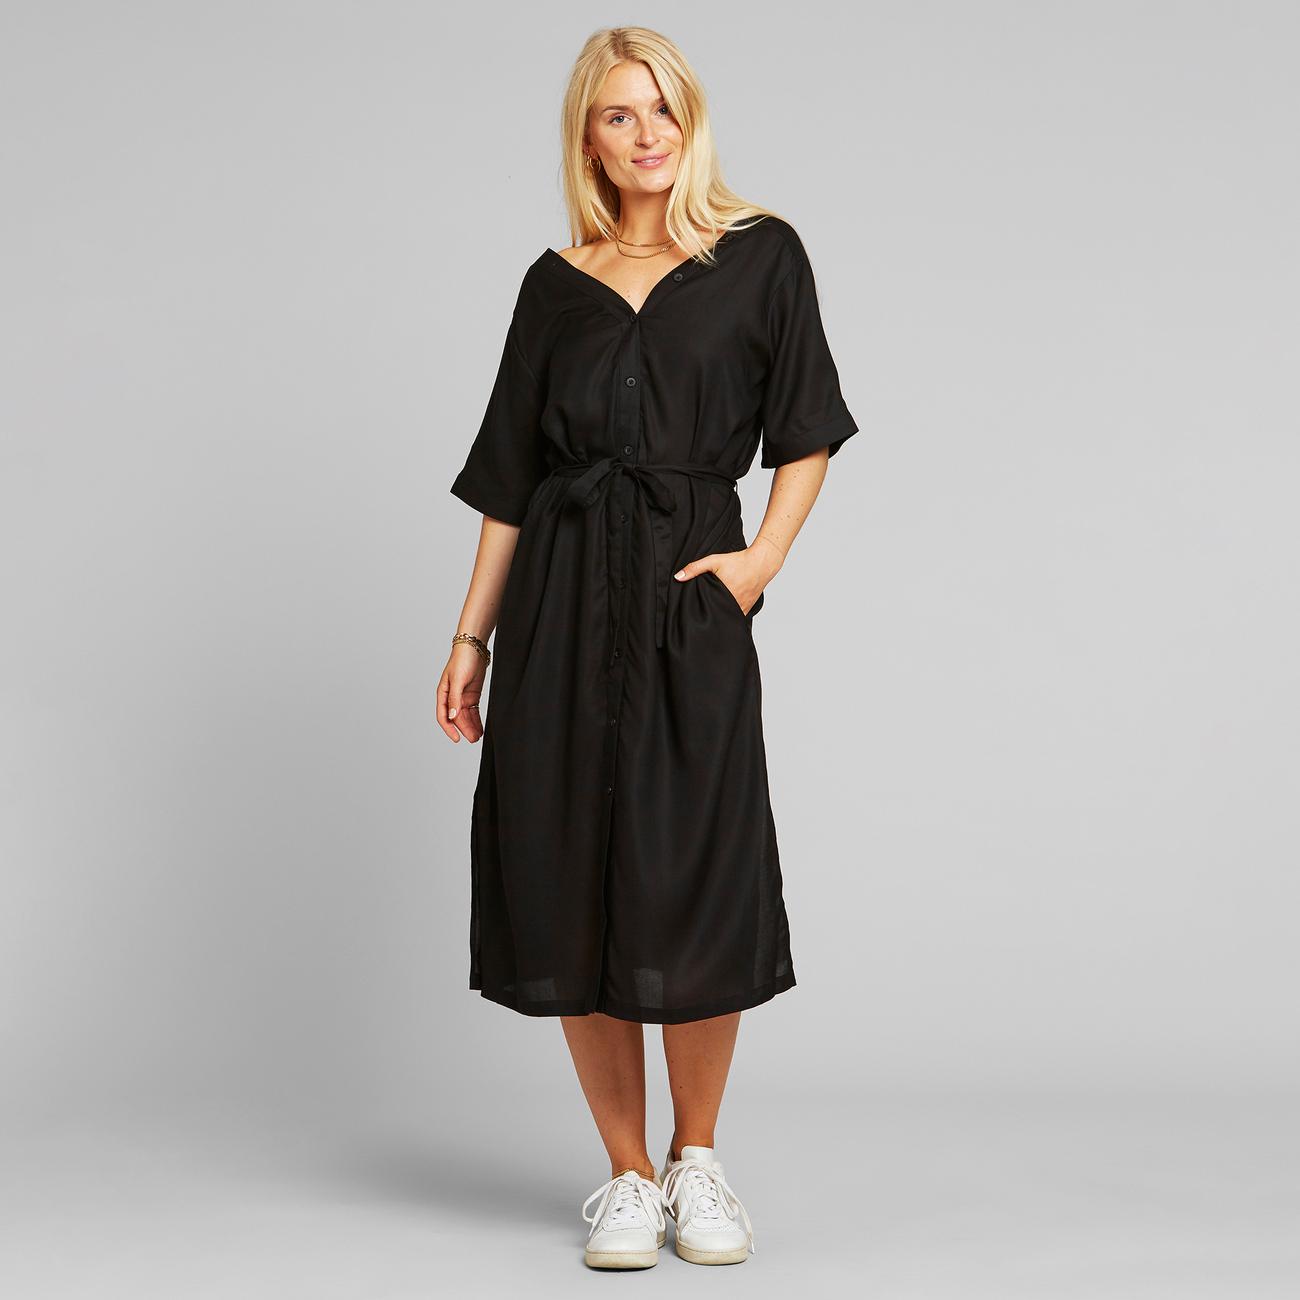 Dress Bornholm Black